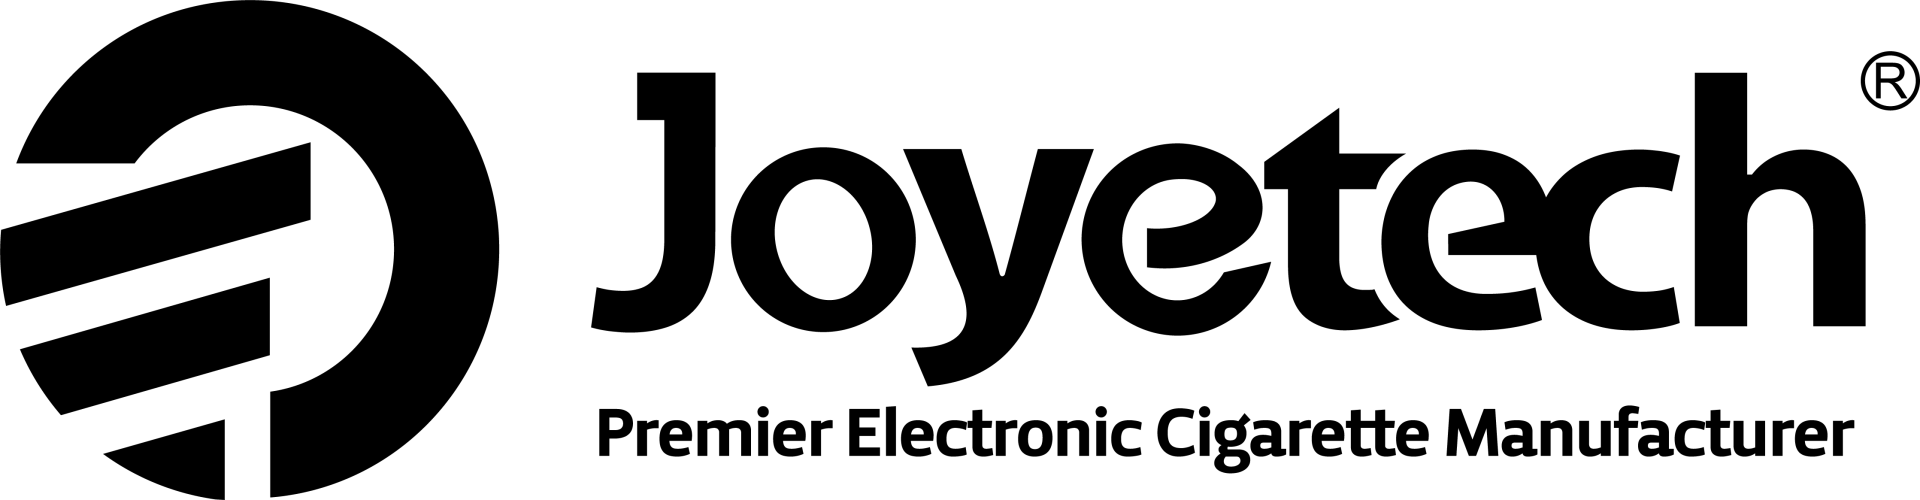 Joyetech Pods